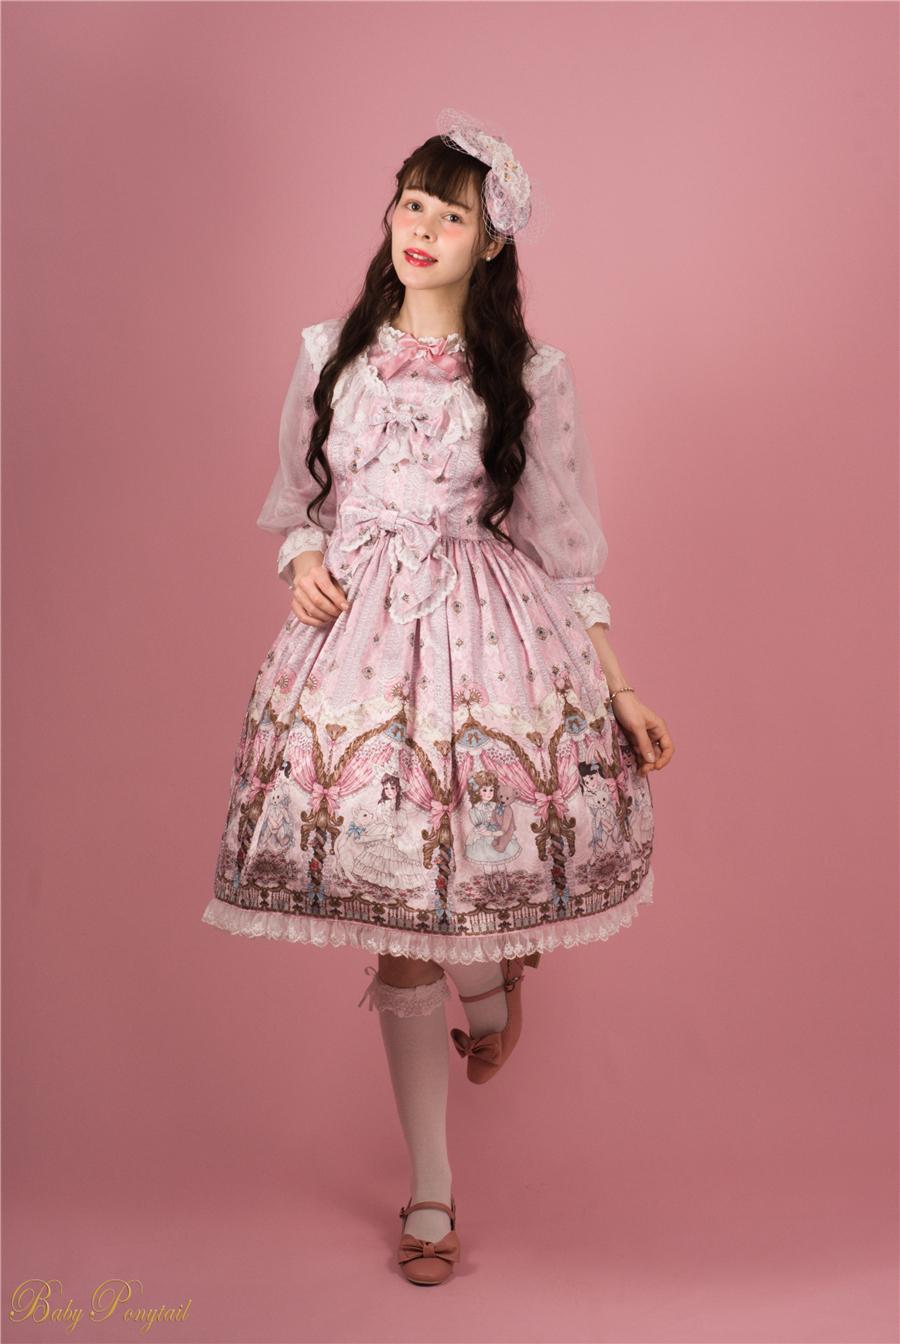 BabyPonytail_Model Photo_My Favorite Companion_OP Pink_6.jpg